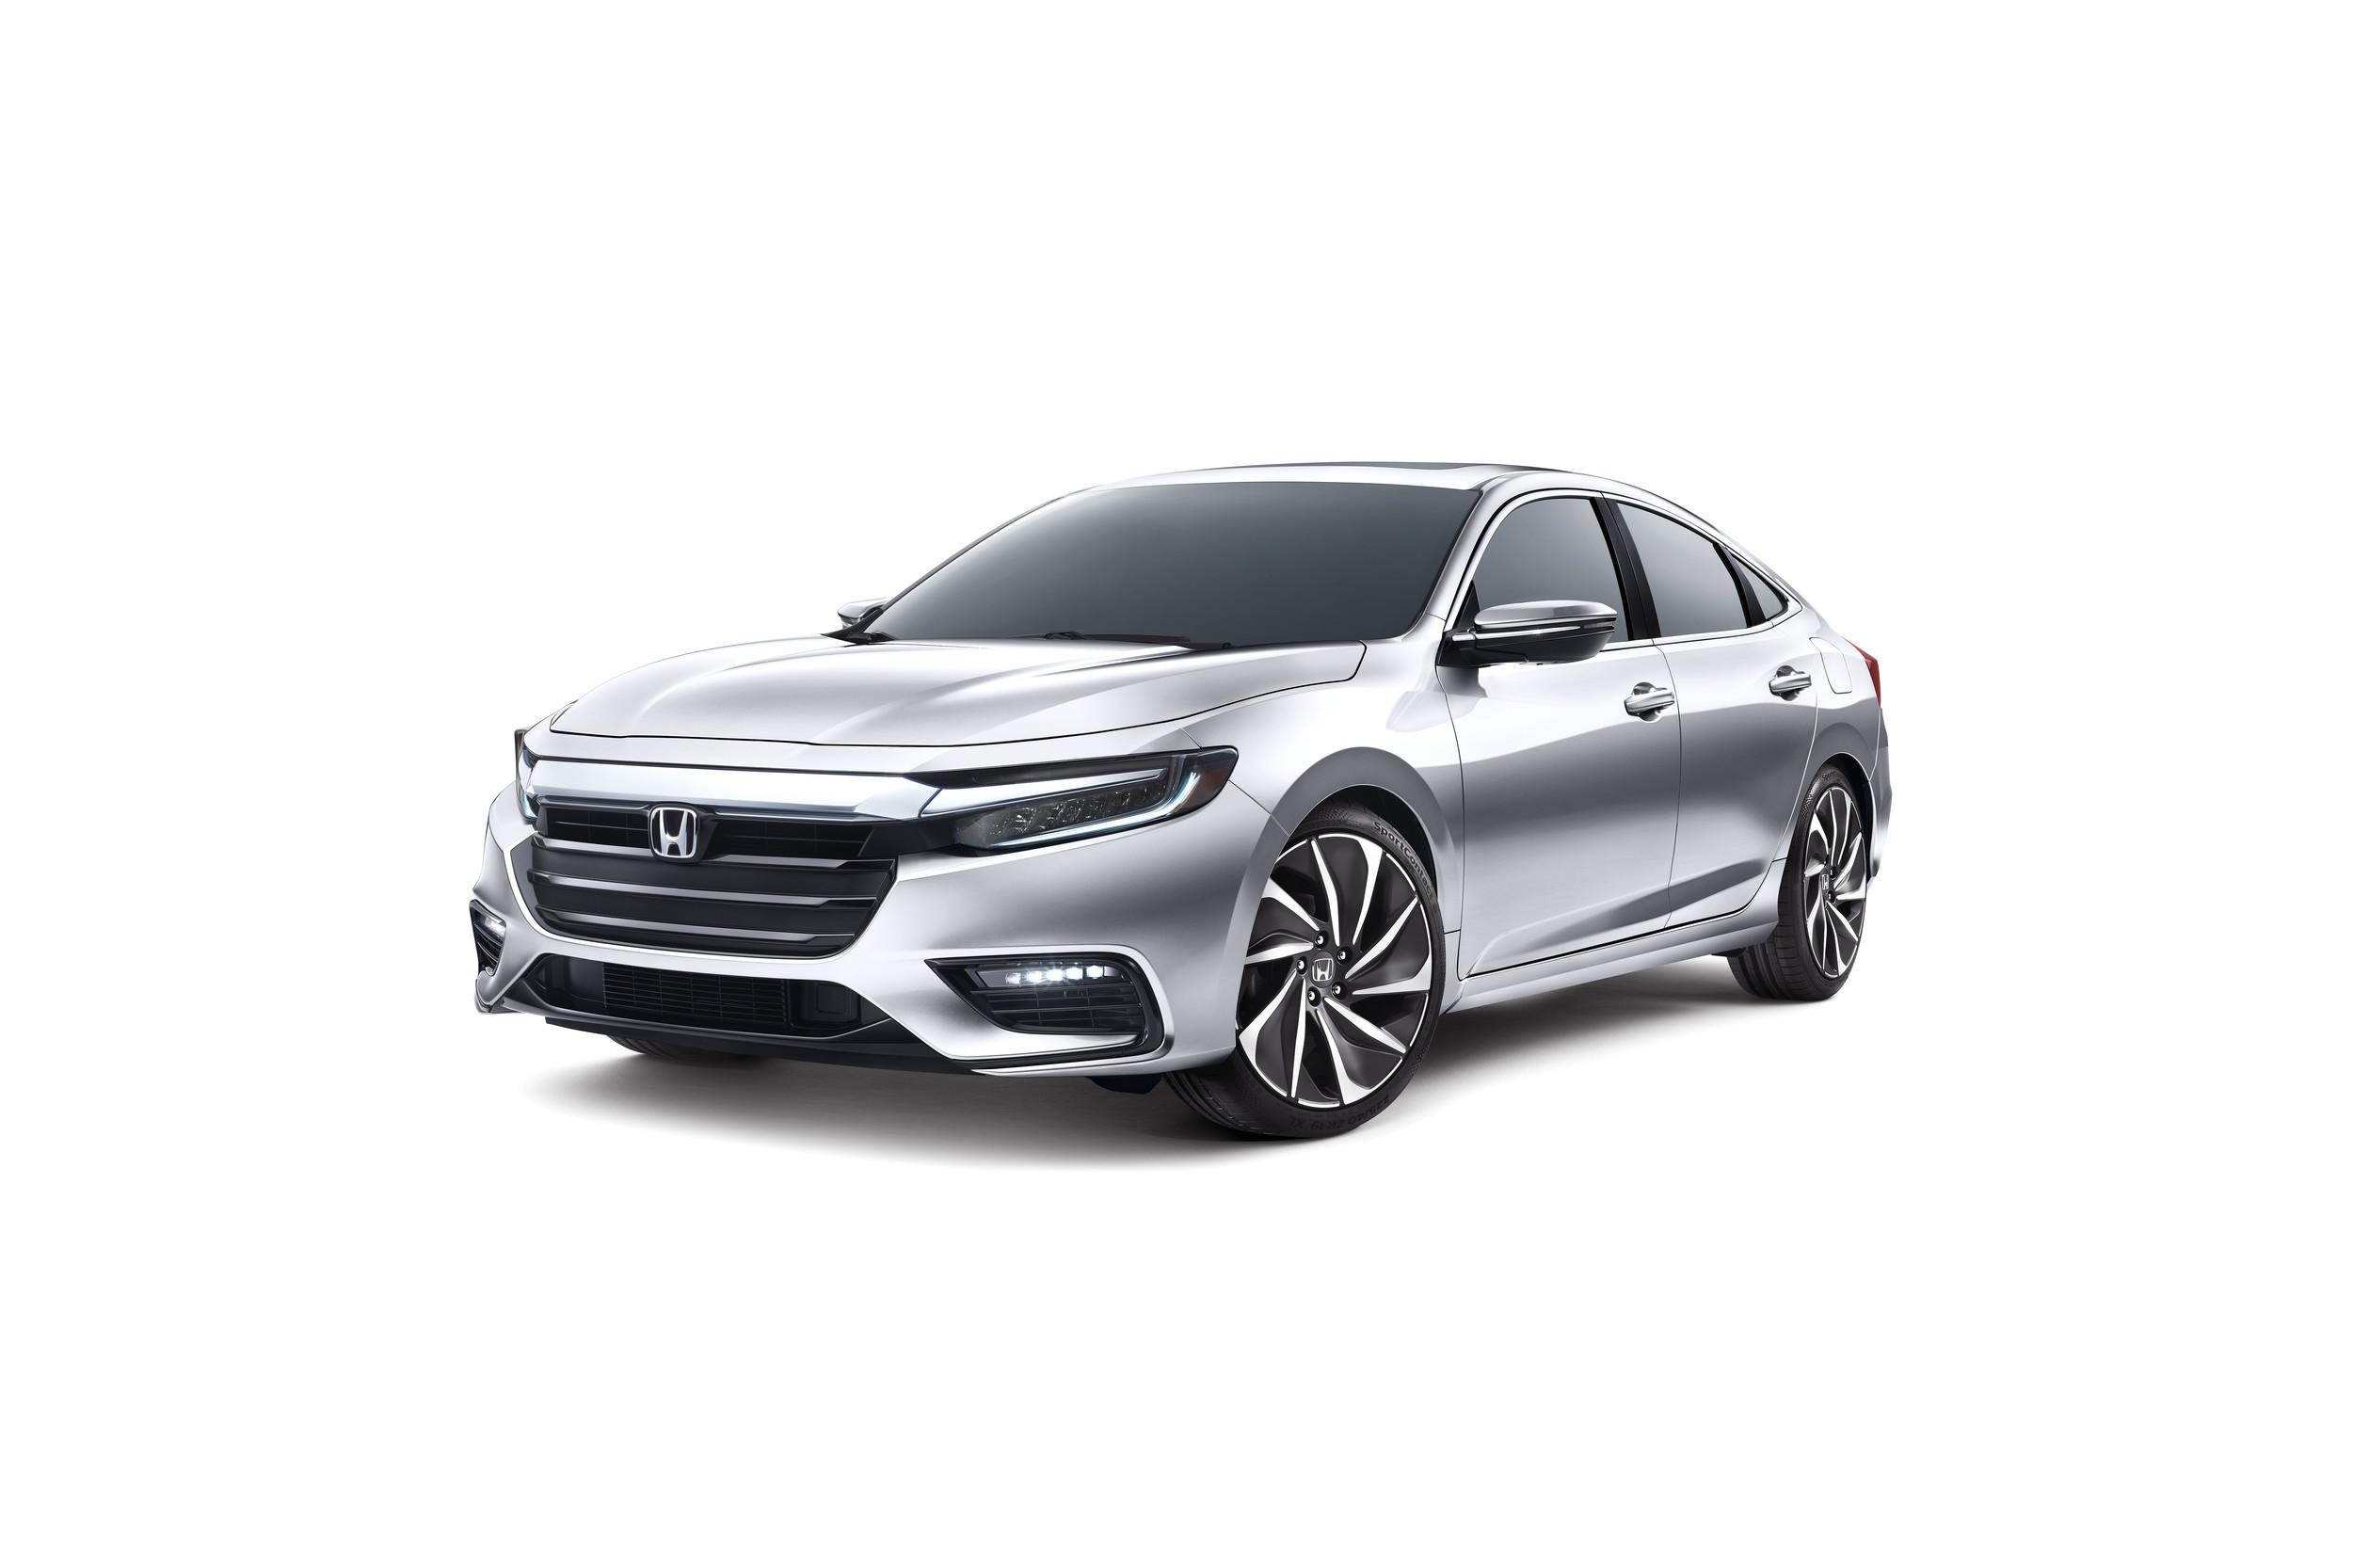 Foto de Honda Insight 2018 (anticipo) (1/12)